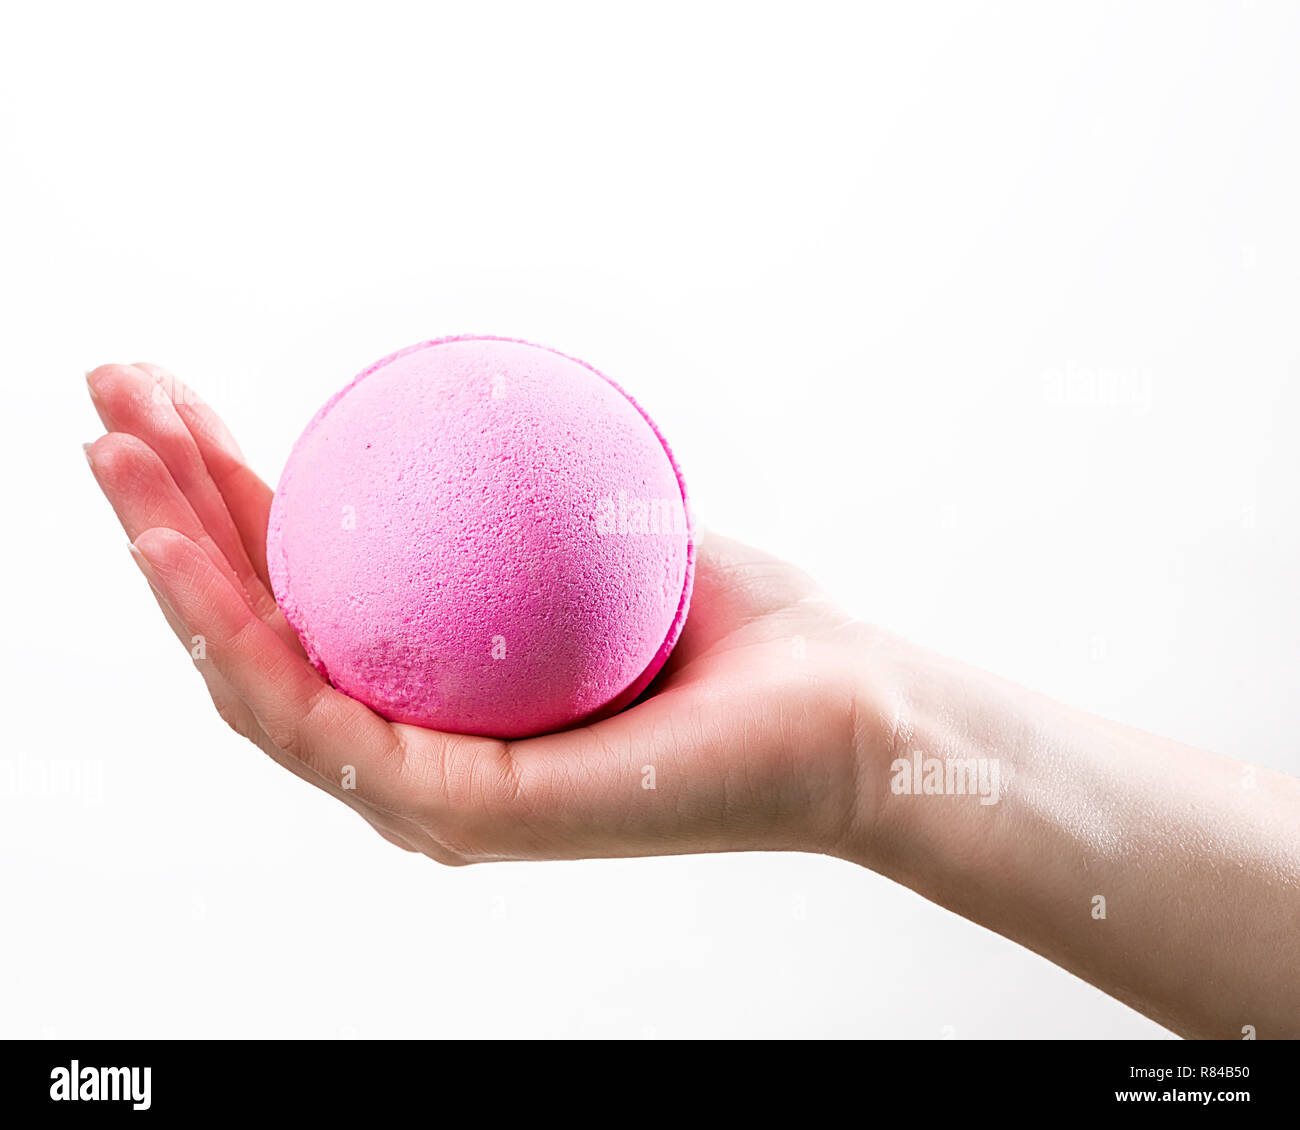 Female hand holding large pink bath bomb on the white background - Stock Image